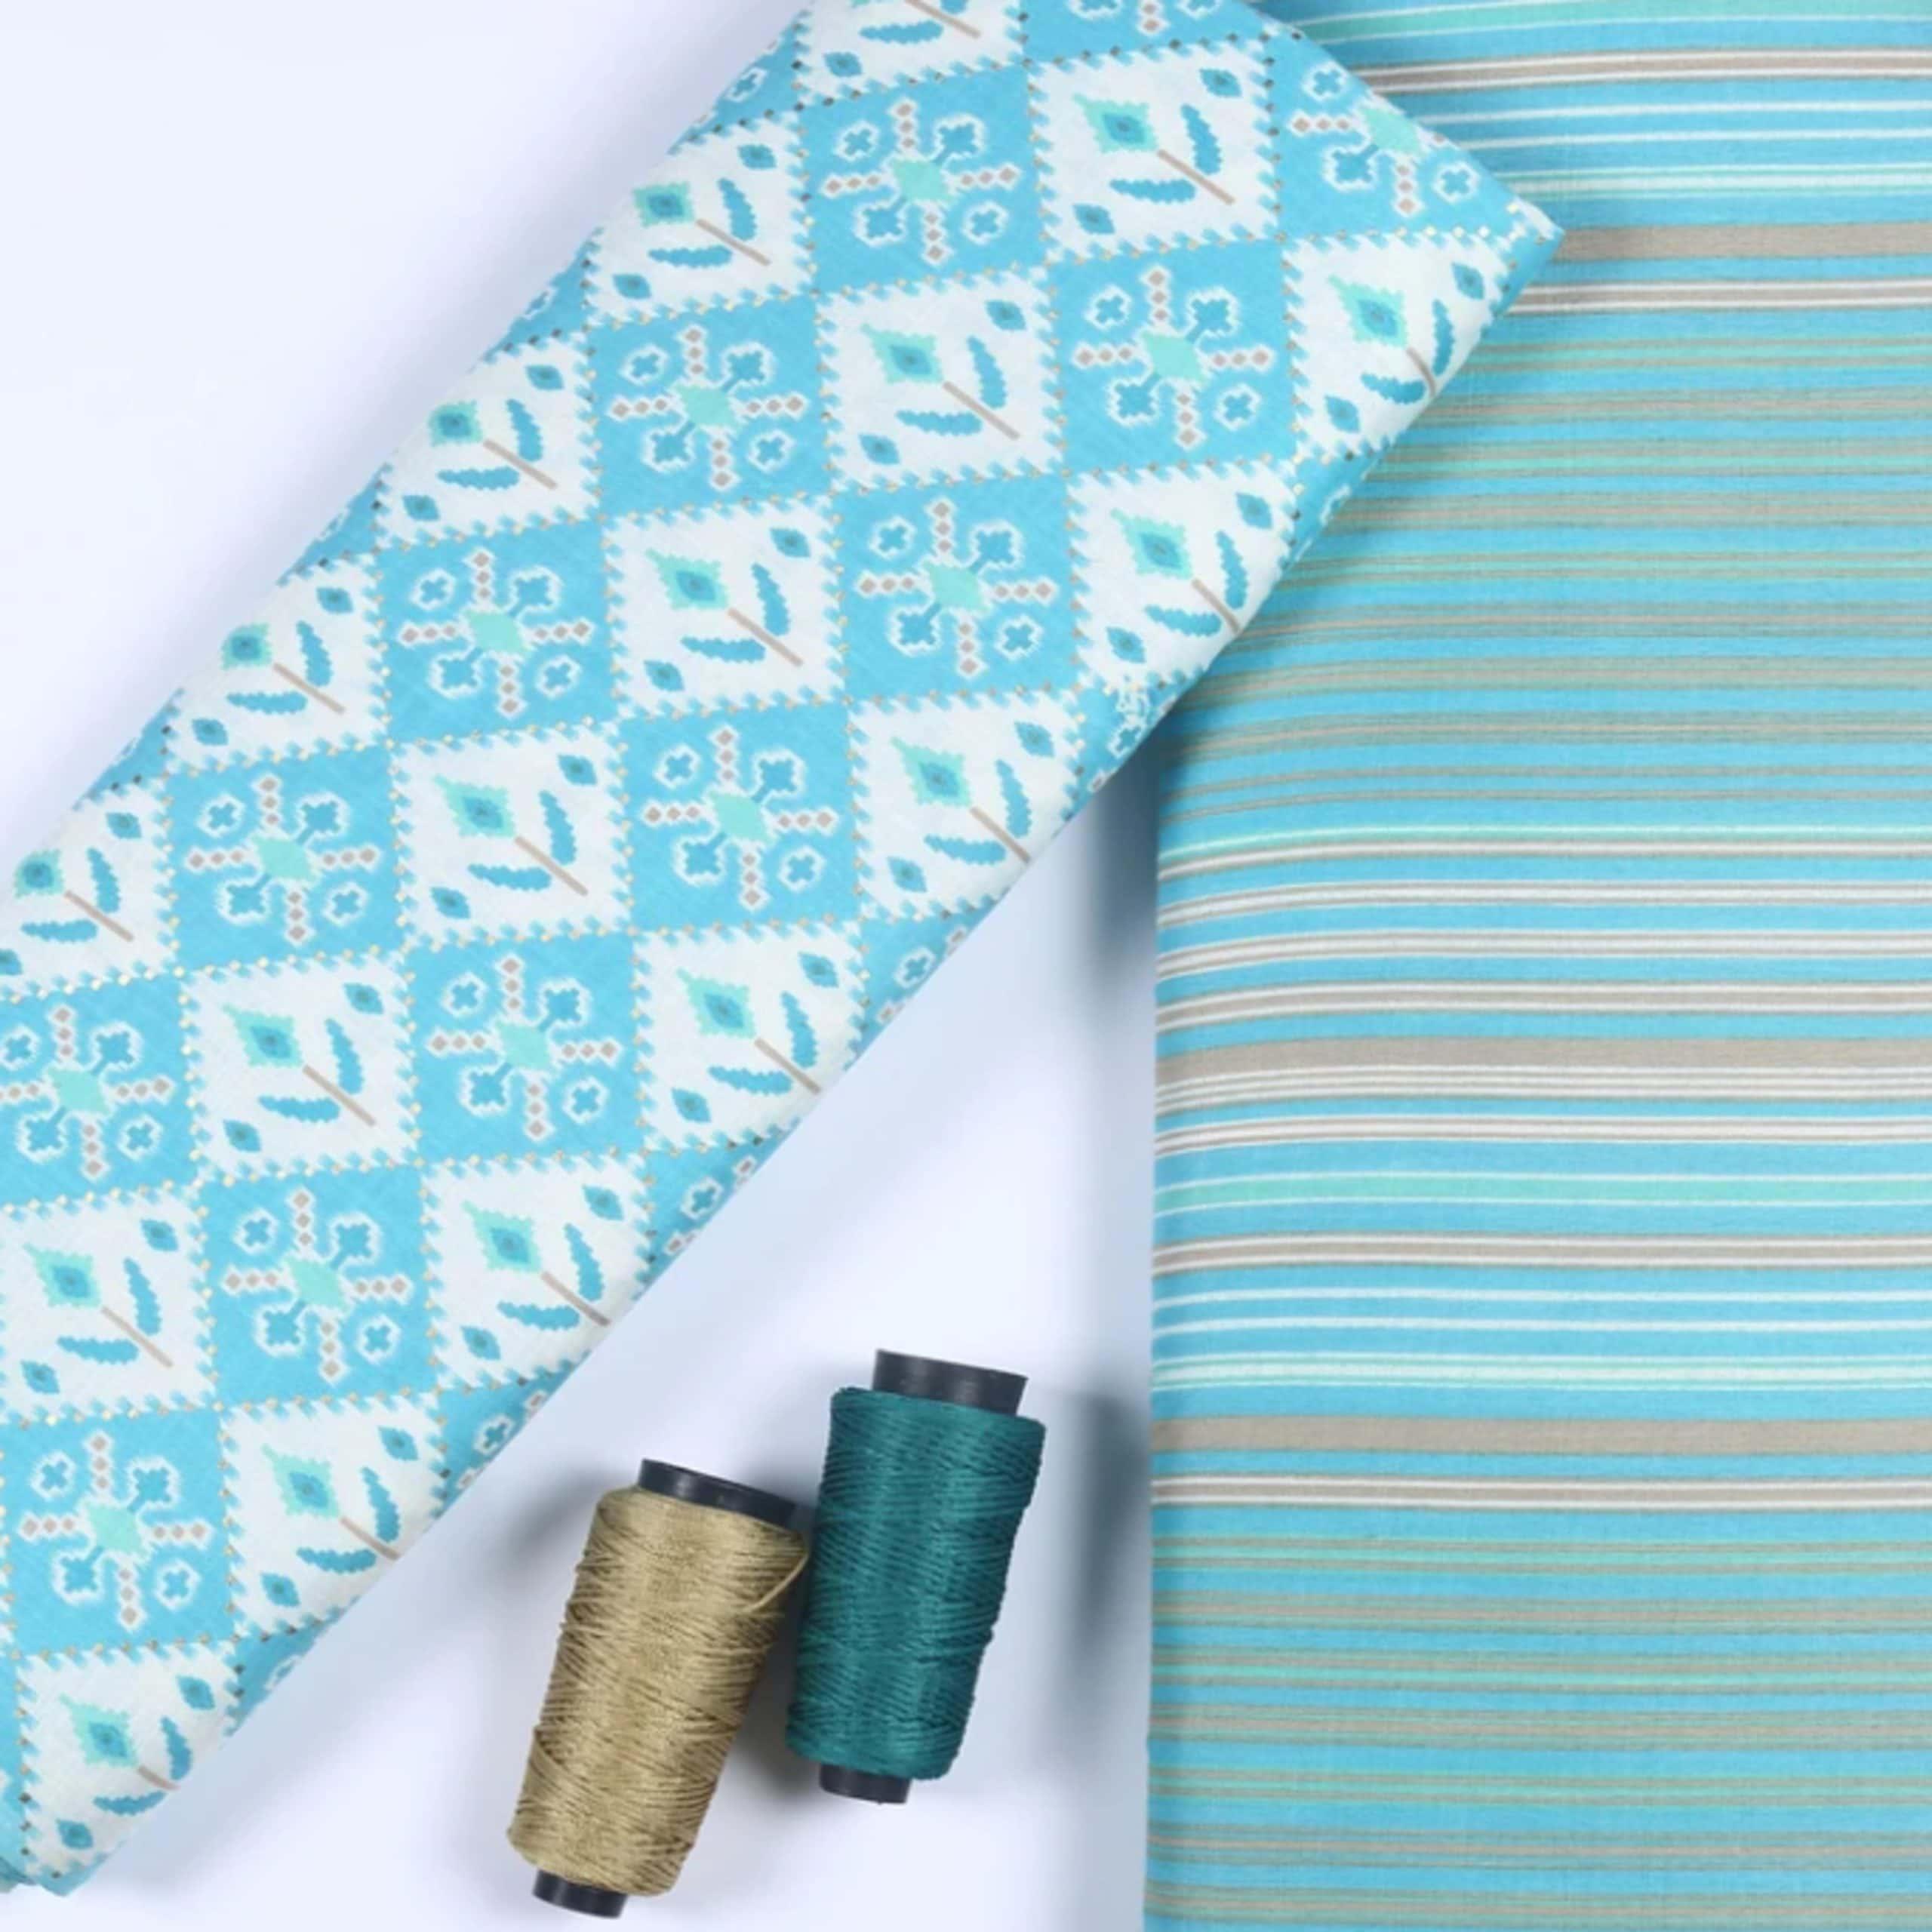 jenis-jenis kain rayon